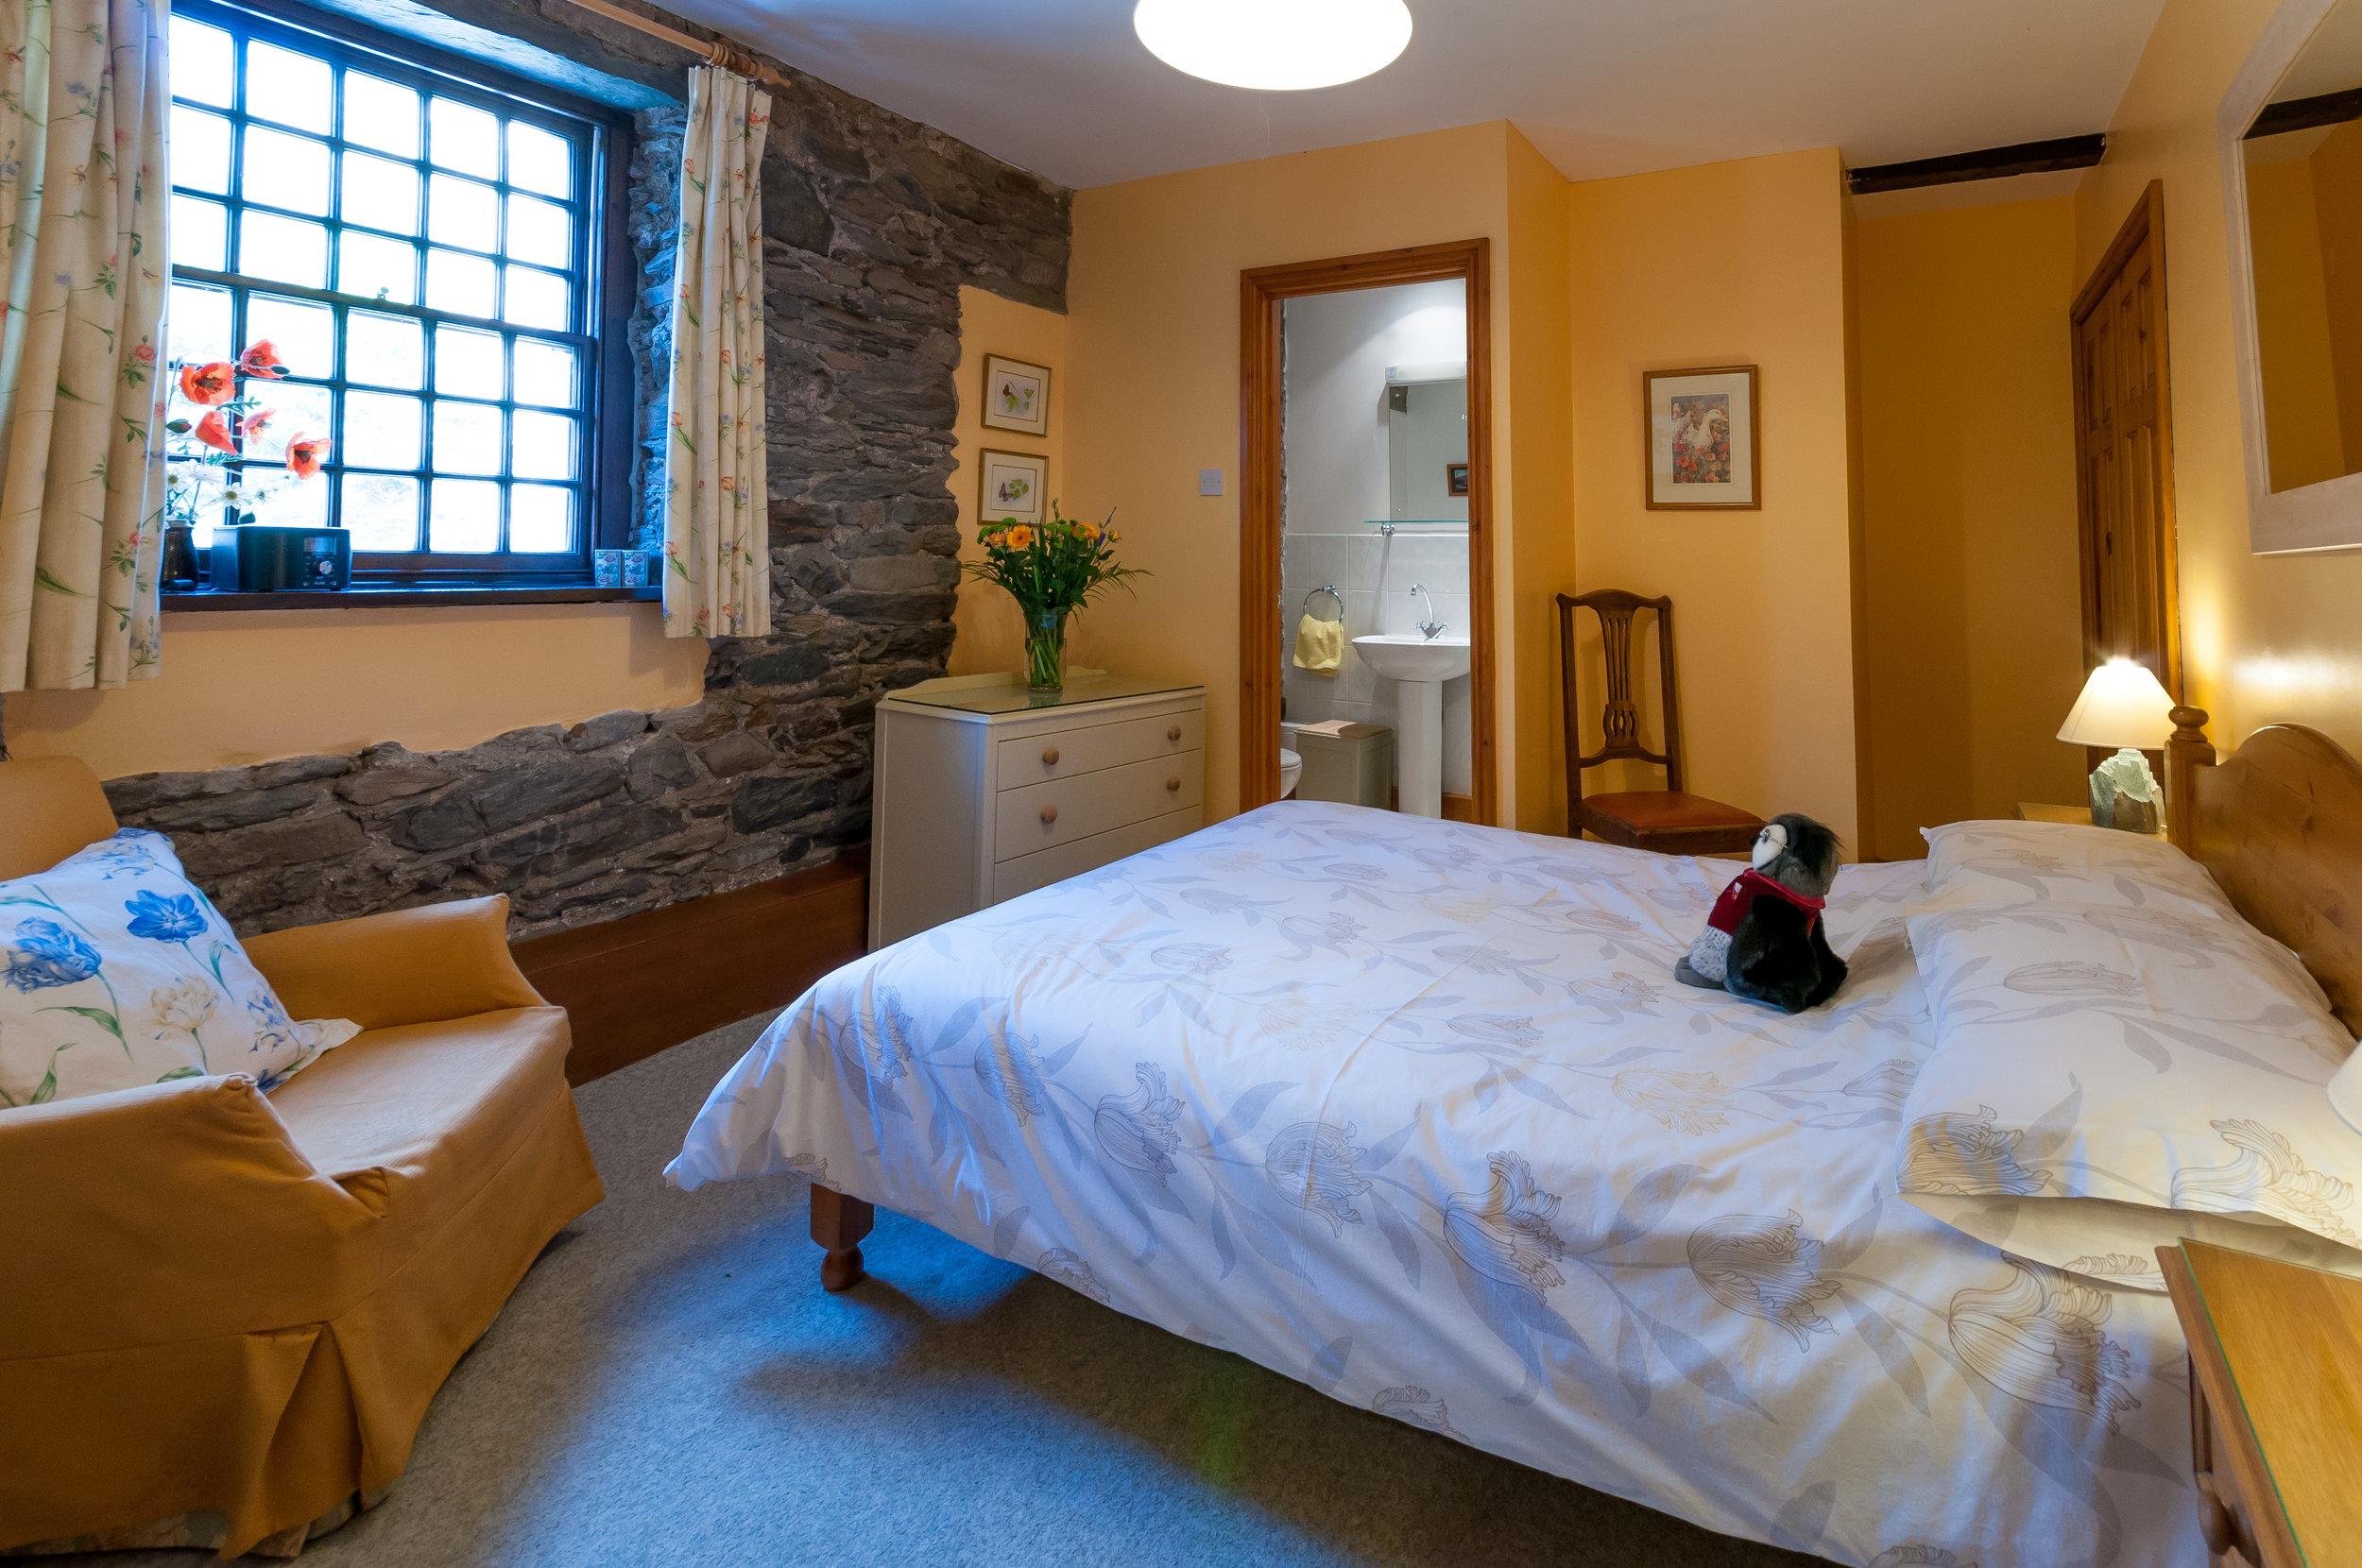 Millbeck+Cottage+Keswick+Holidays+Self+Catering+Ensuite+Master+Bedroom.jpg